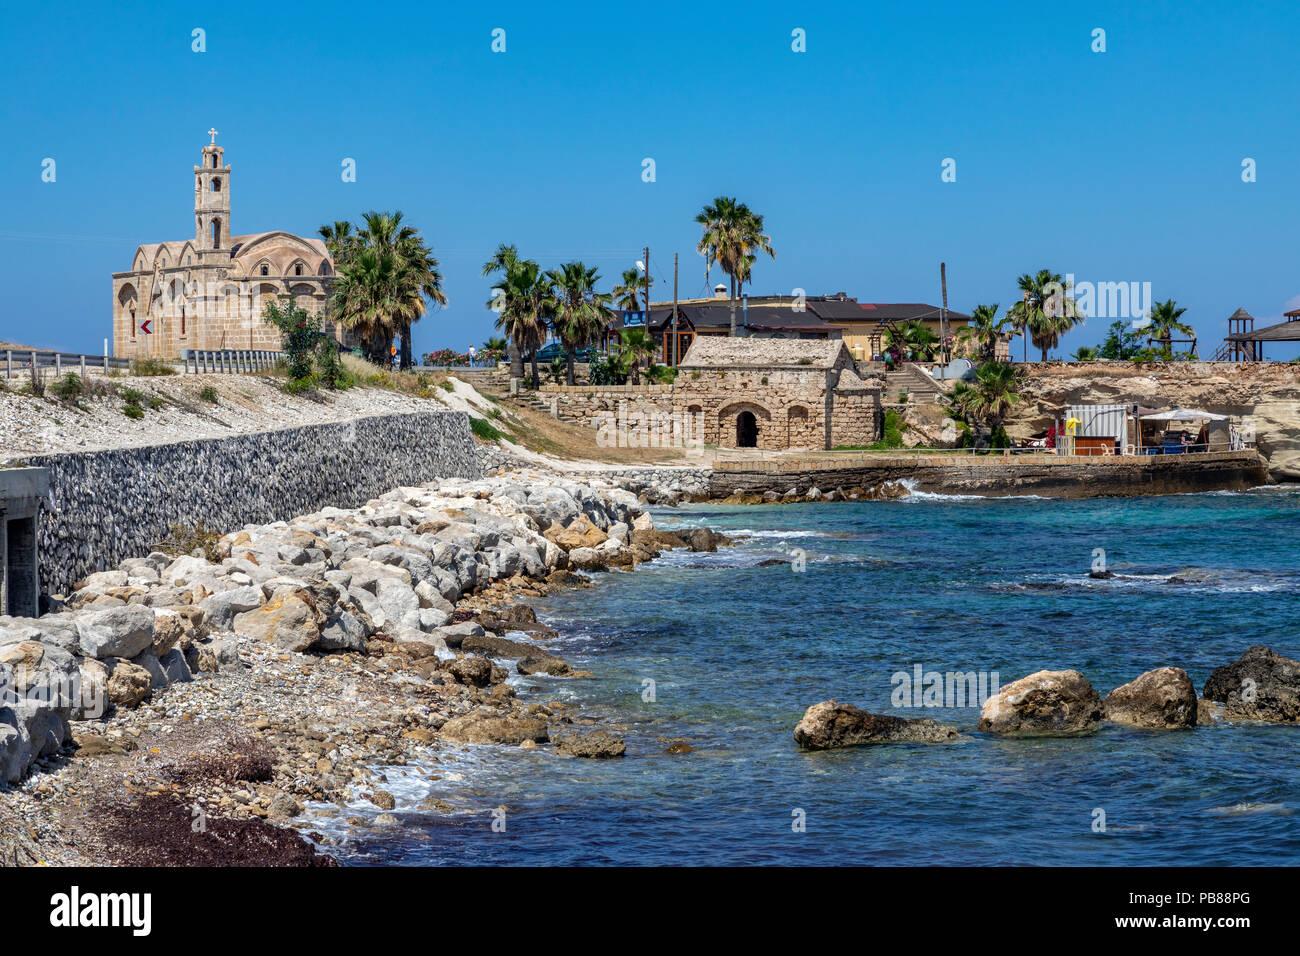 The Agios Thyrsos Church on the Karpasia Peninsula in Turkish Cyprus. (Turkish Republic of Northern Cyprus). Stock Photo